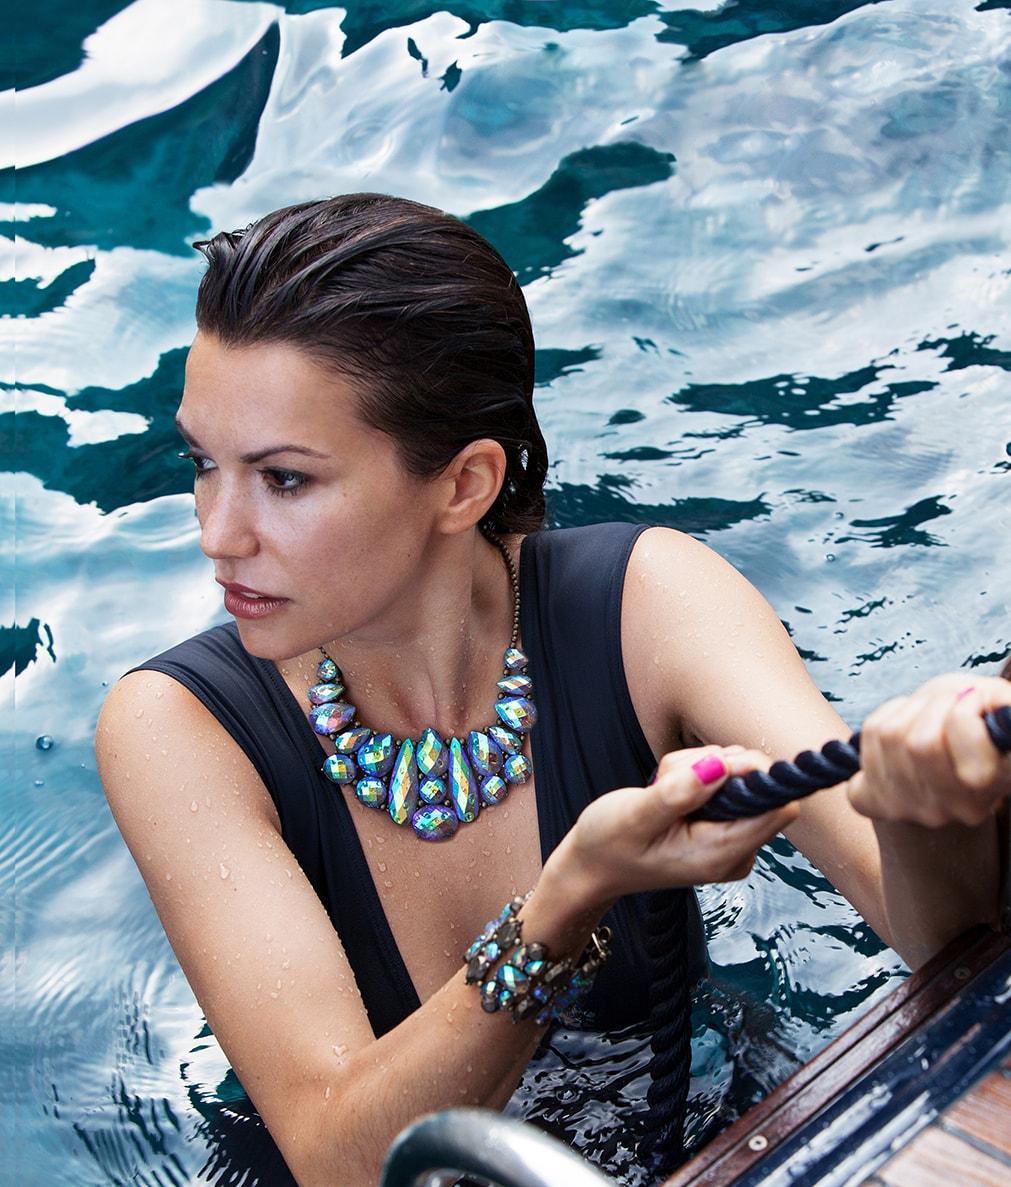 victoria-munoz-photo-commercial-22